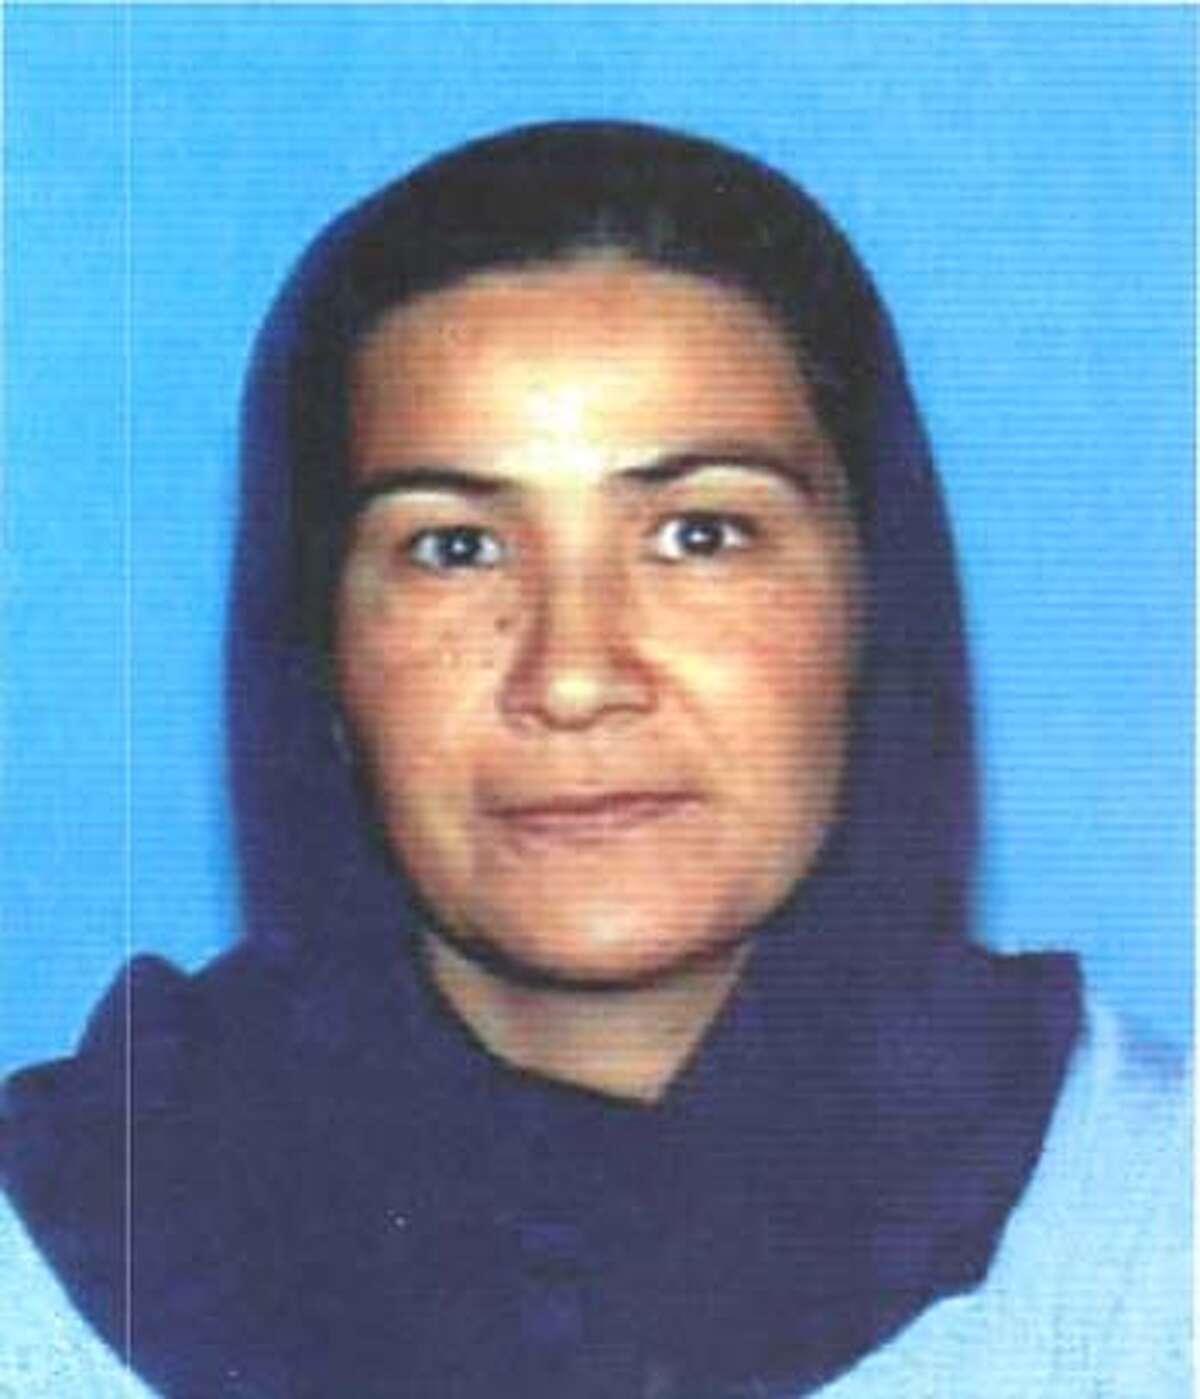 DMV photo of Alia Ansari. Credit: Courtesy of DMV